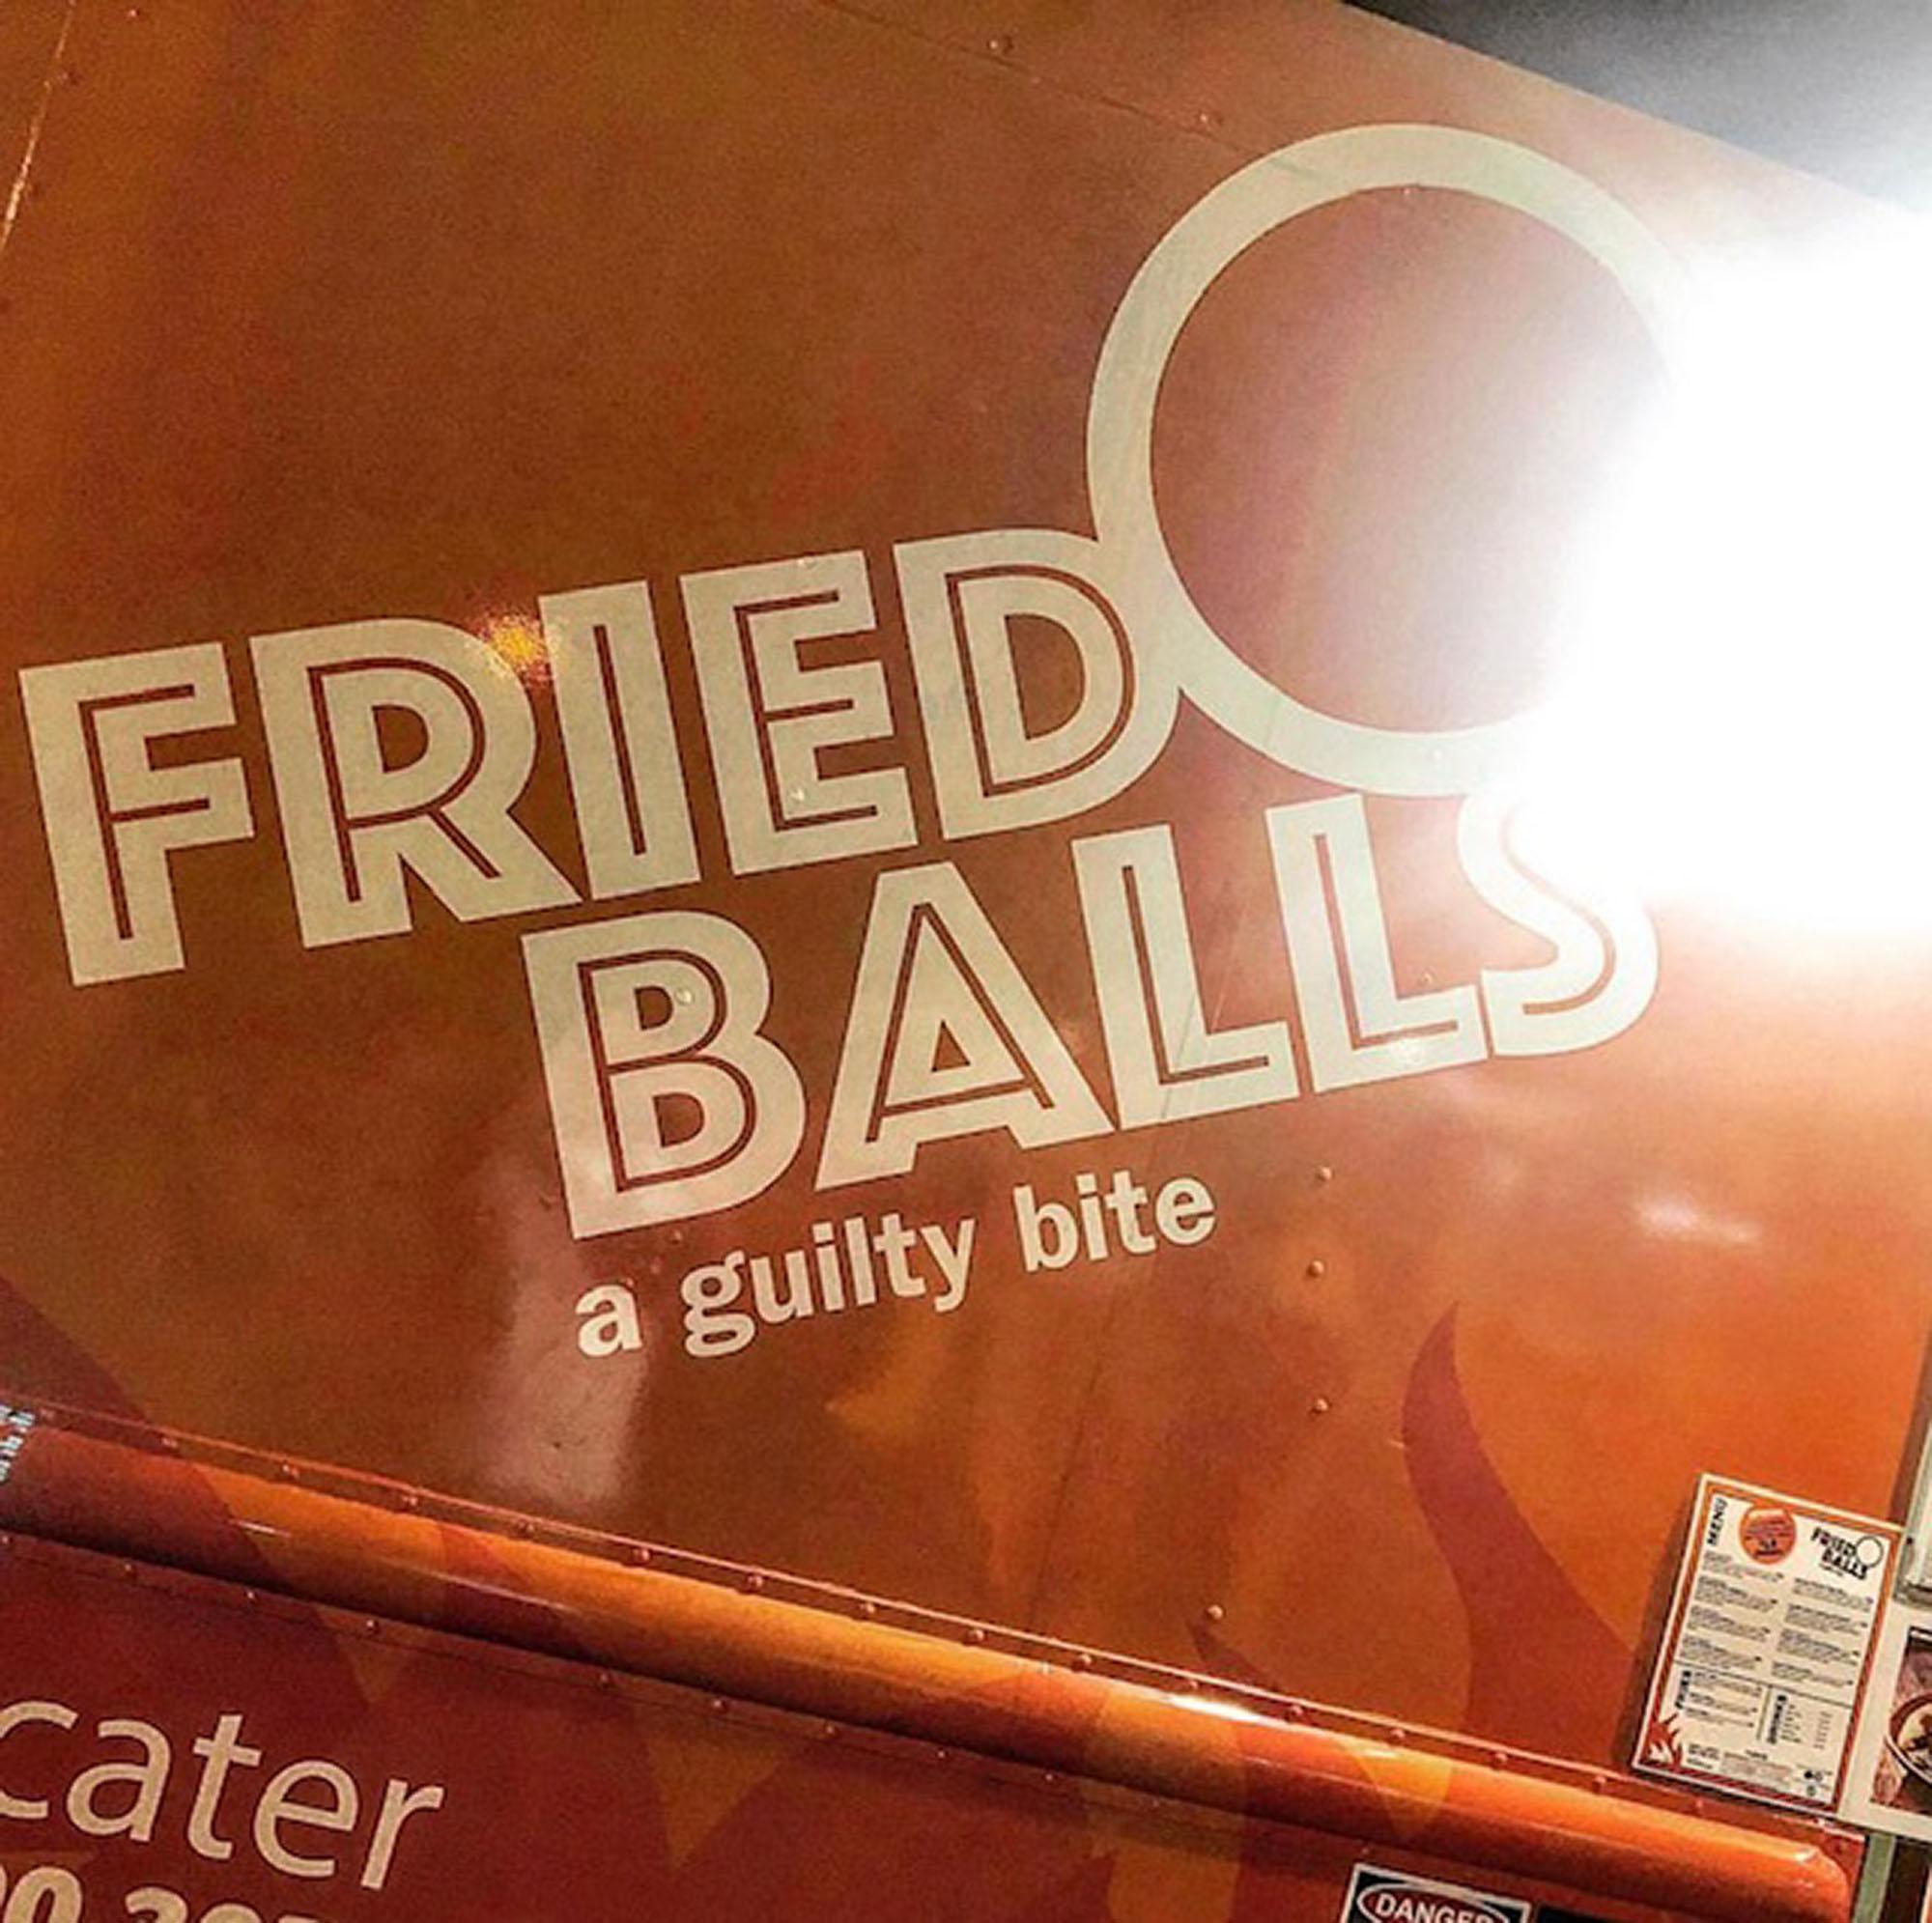 Fried Balls